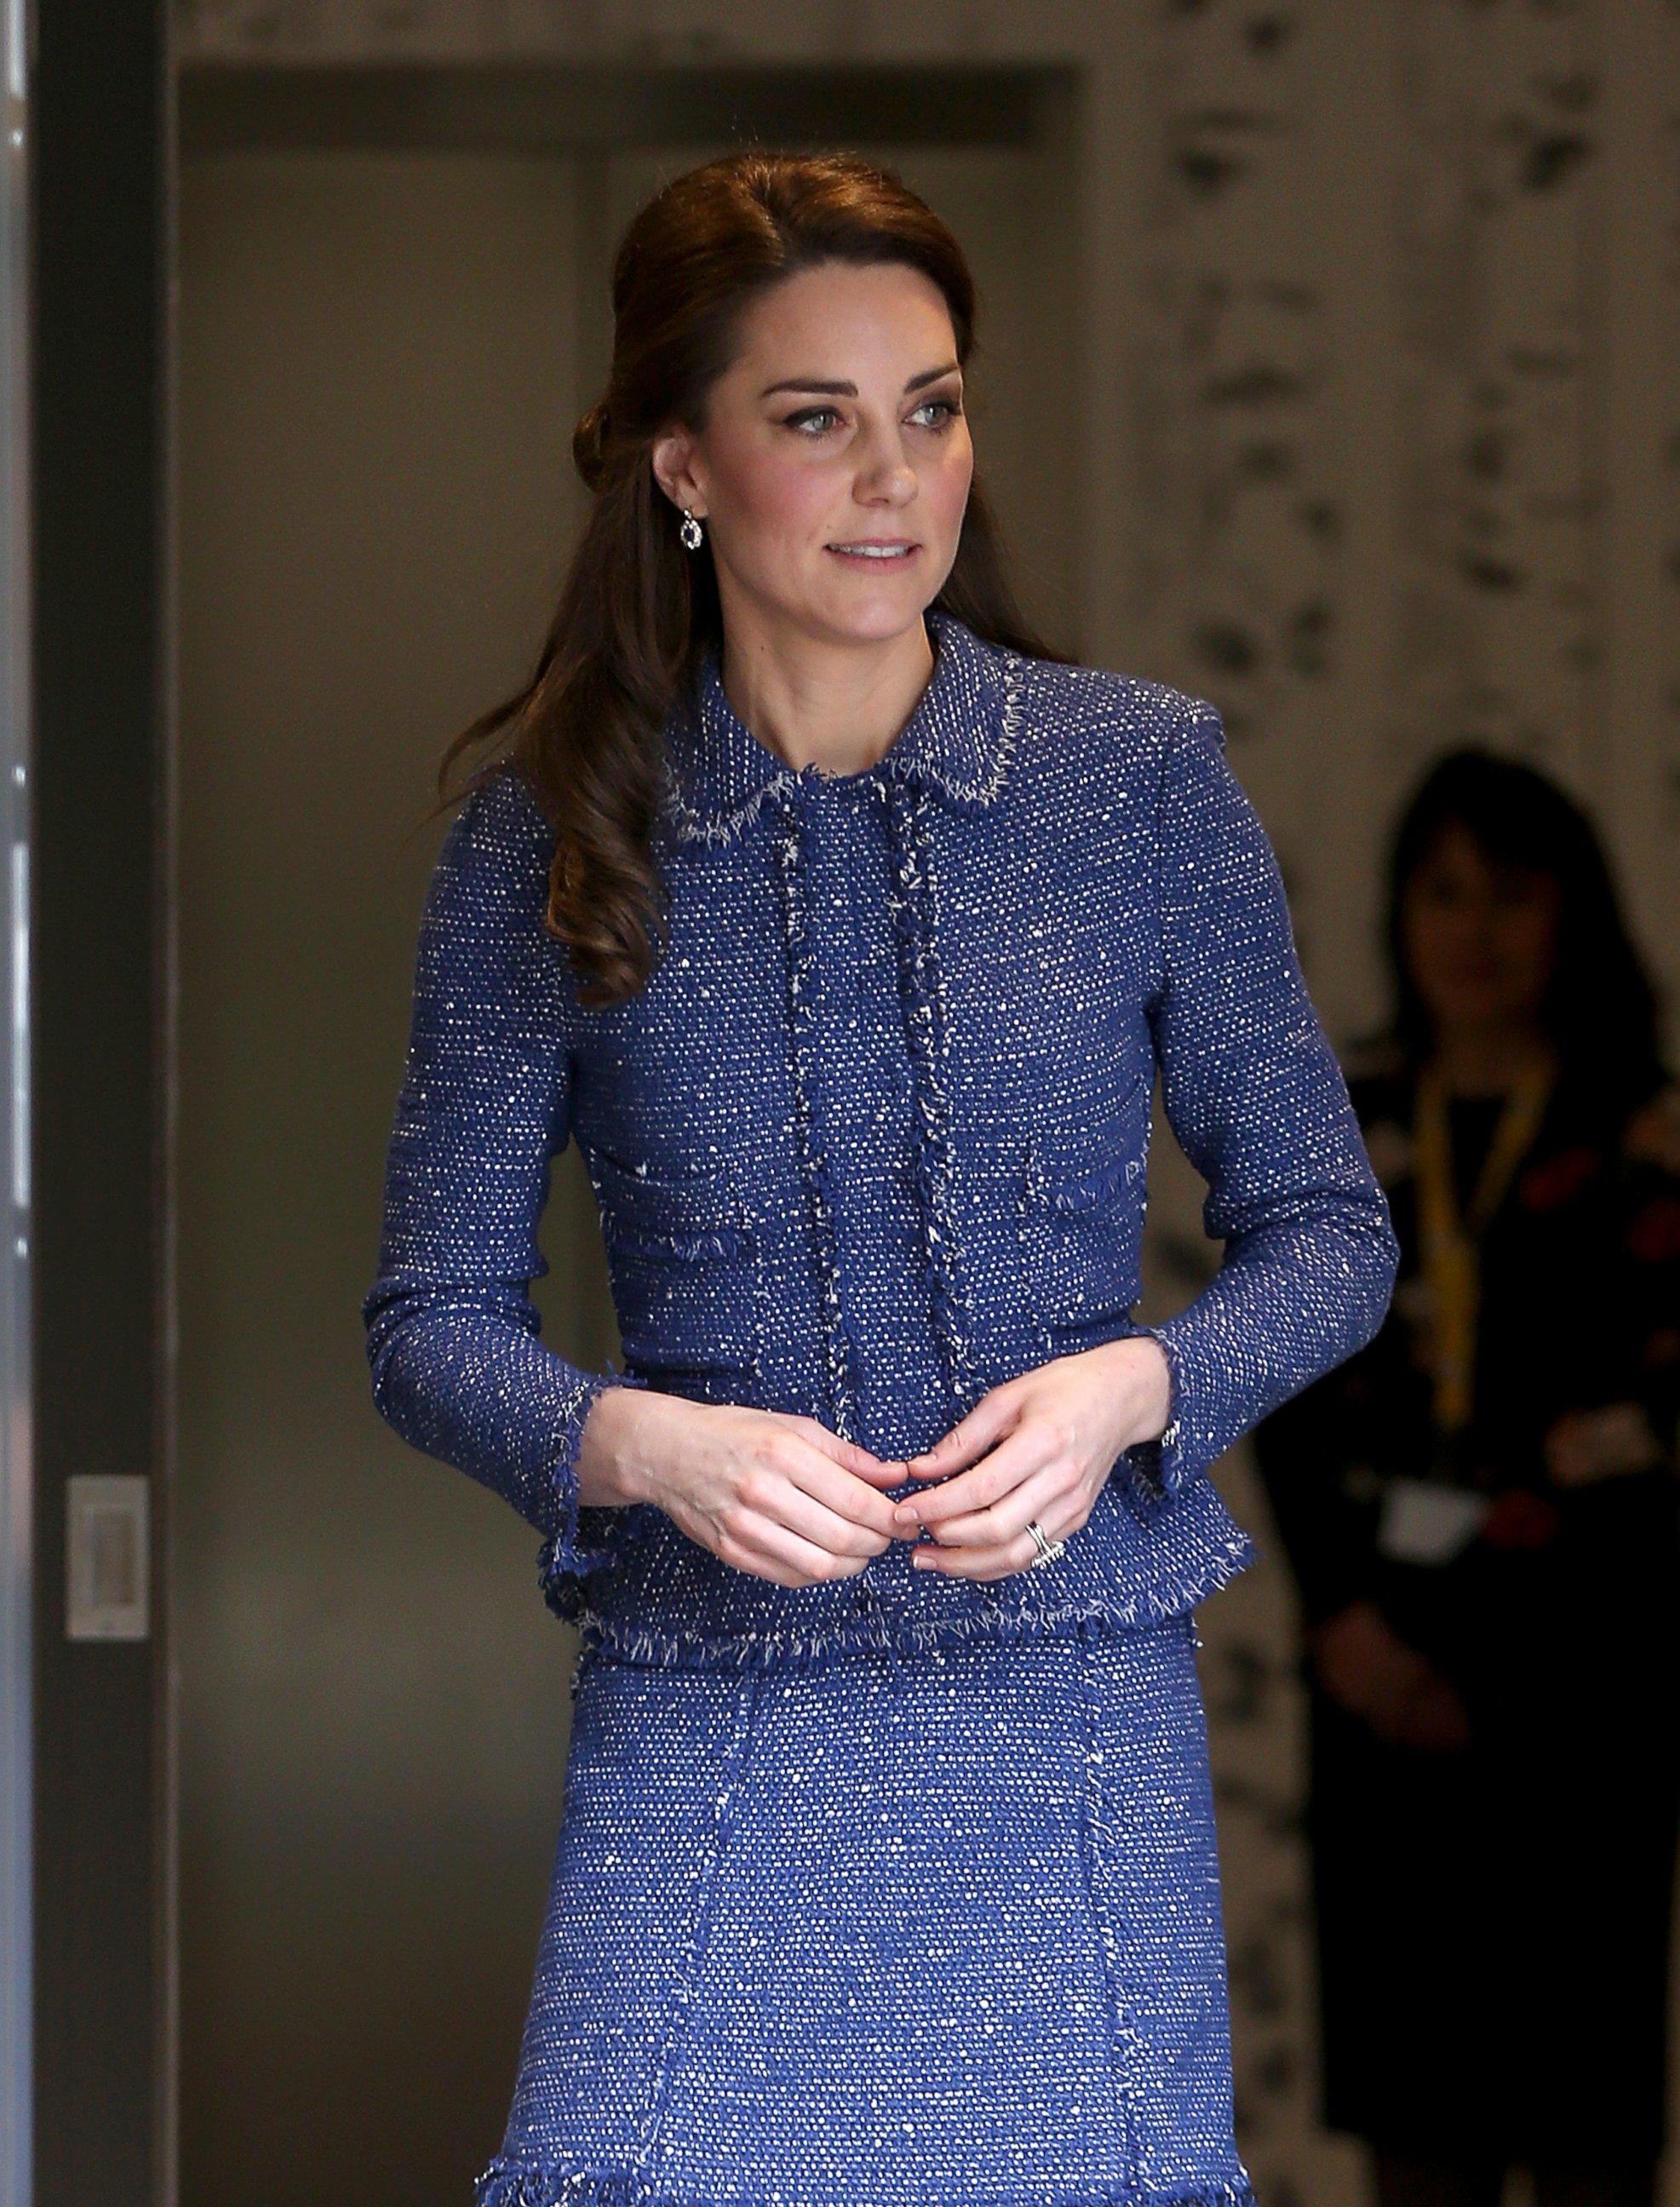 Duchess Kate visits a hospital